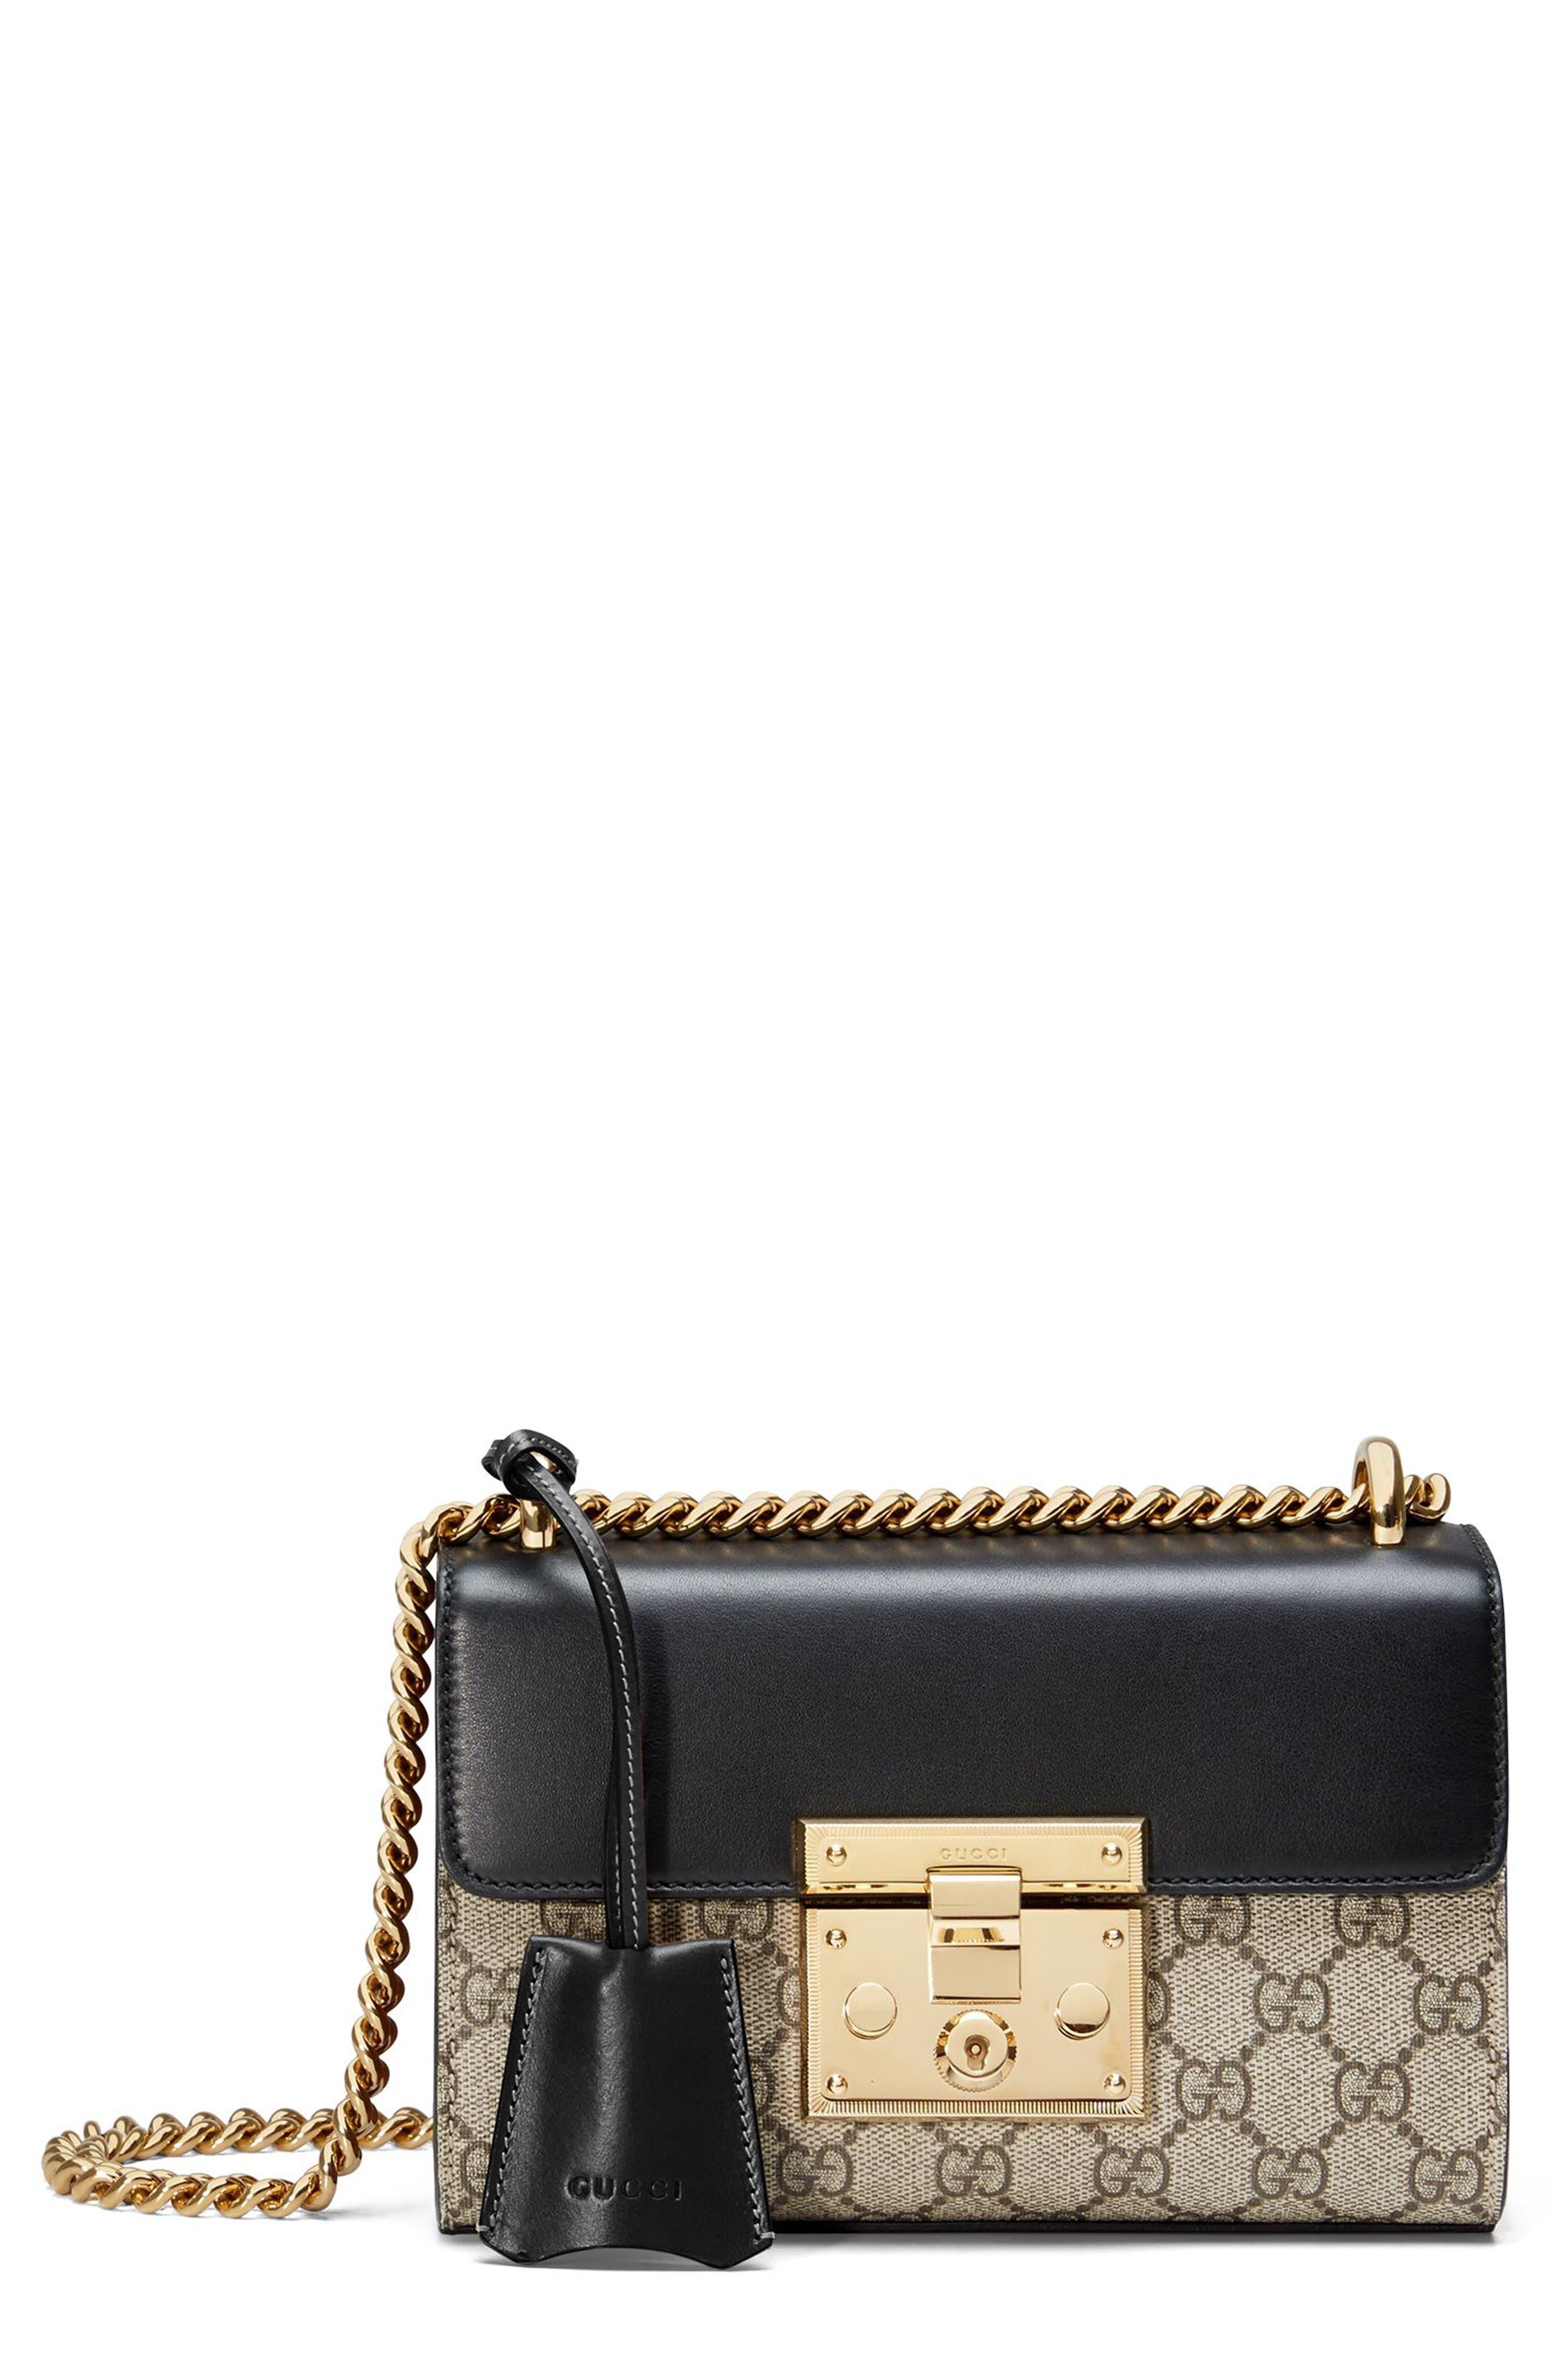 GUCCI, Small Padlock GG Supreme Canvas & Leather Shoulder Bag, Main thumbnail 1, color, MOON/TOSCANO